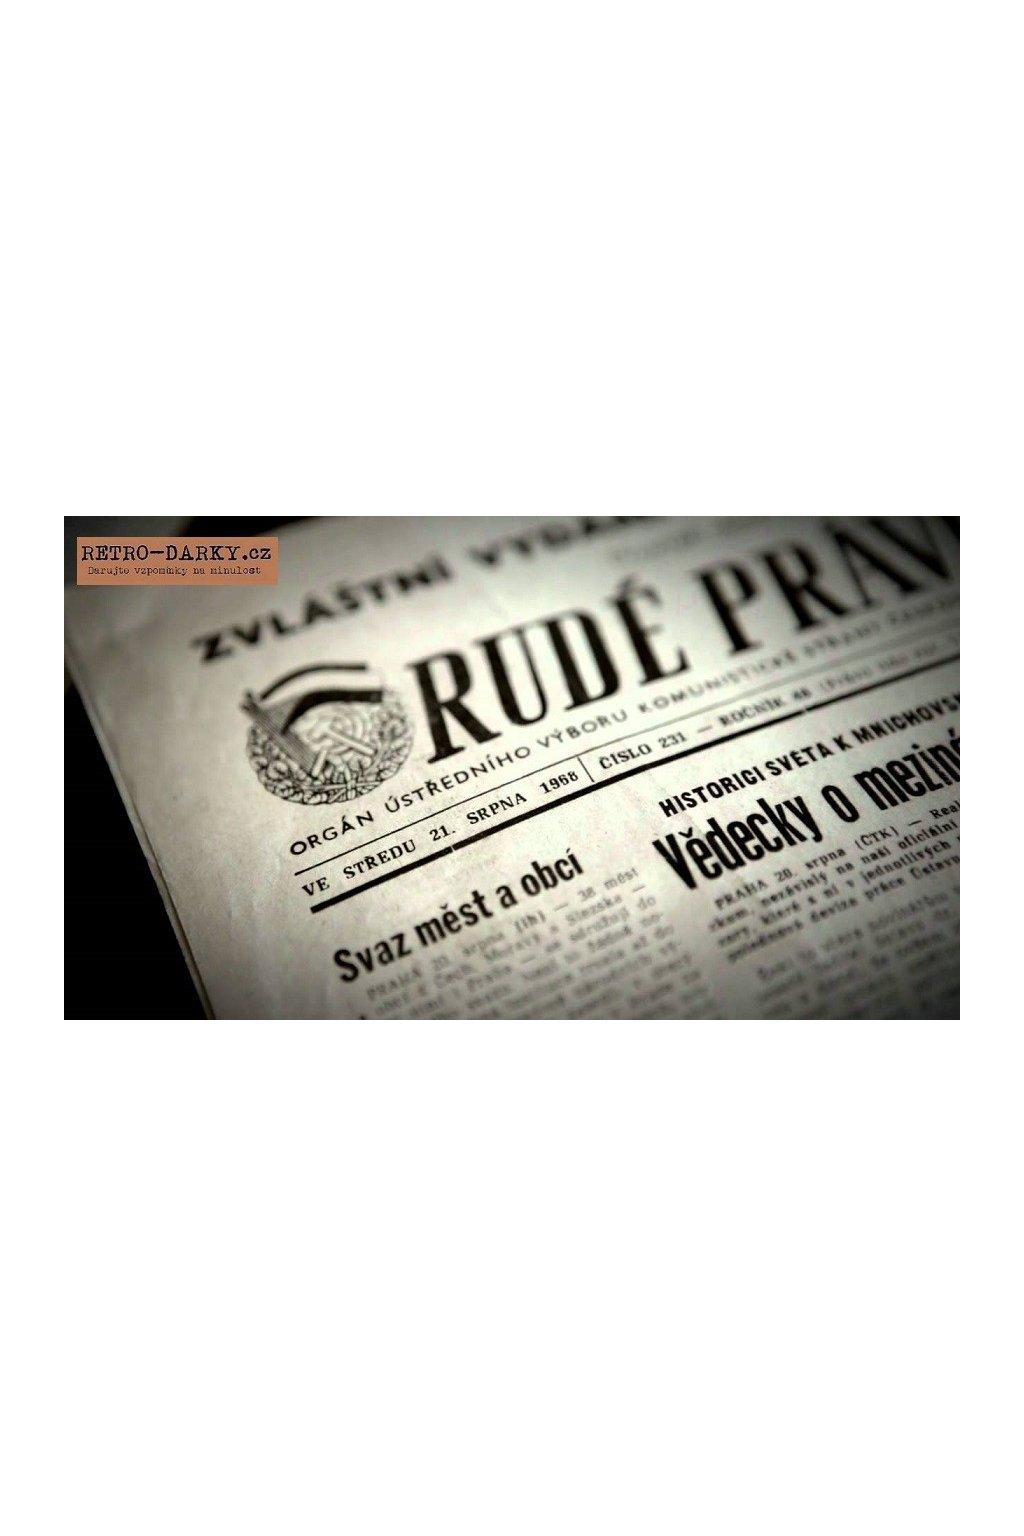 179 noviny ze dne narozeni rude pravo